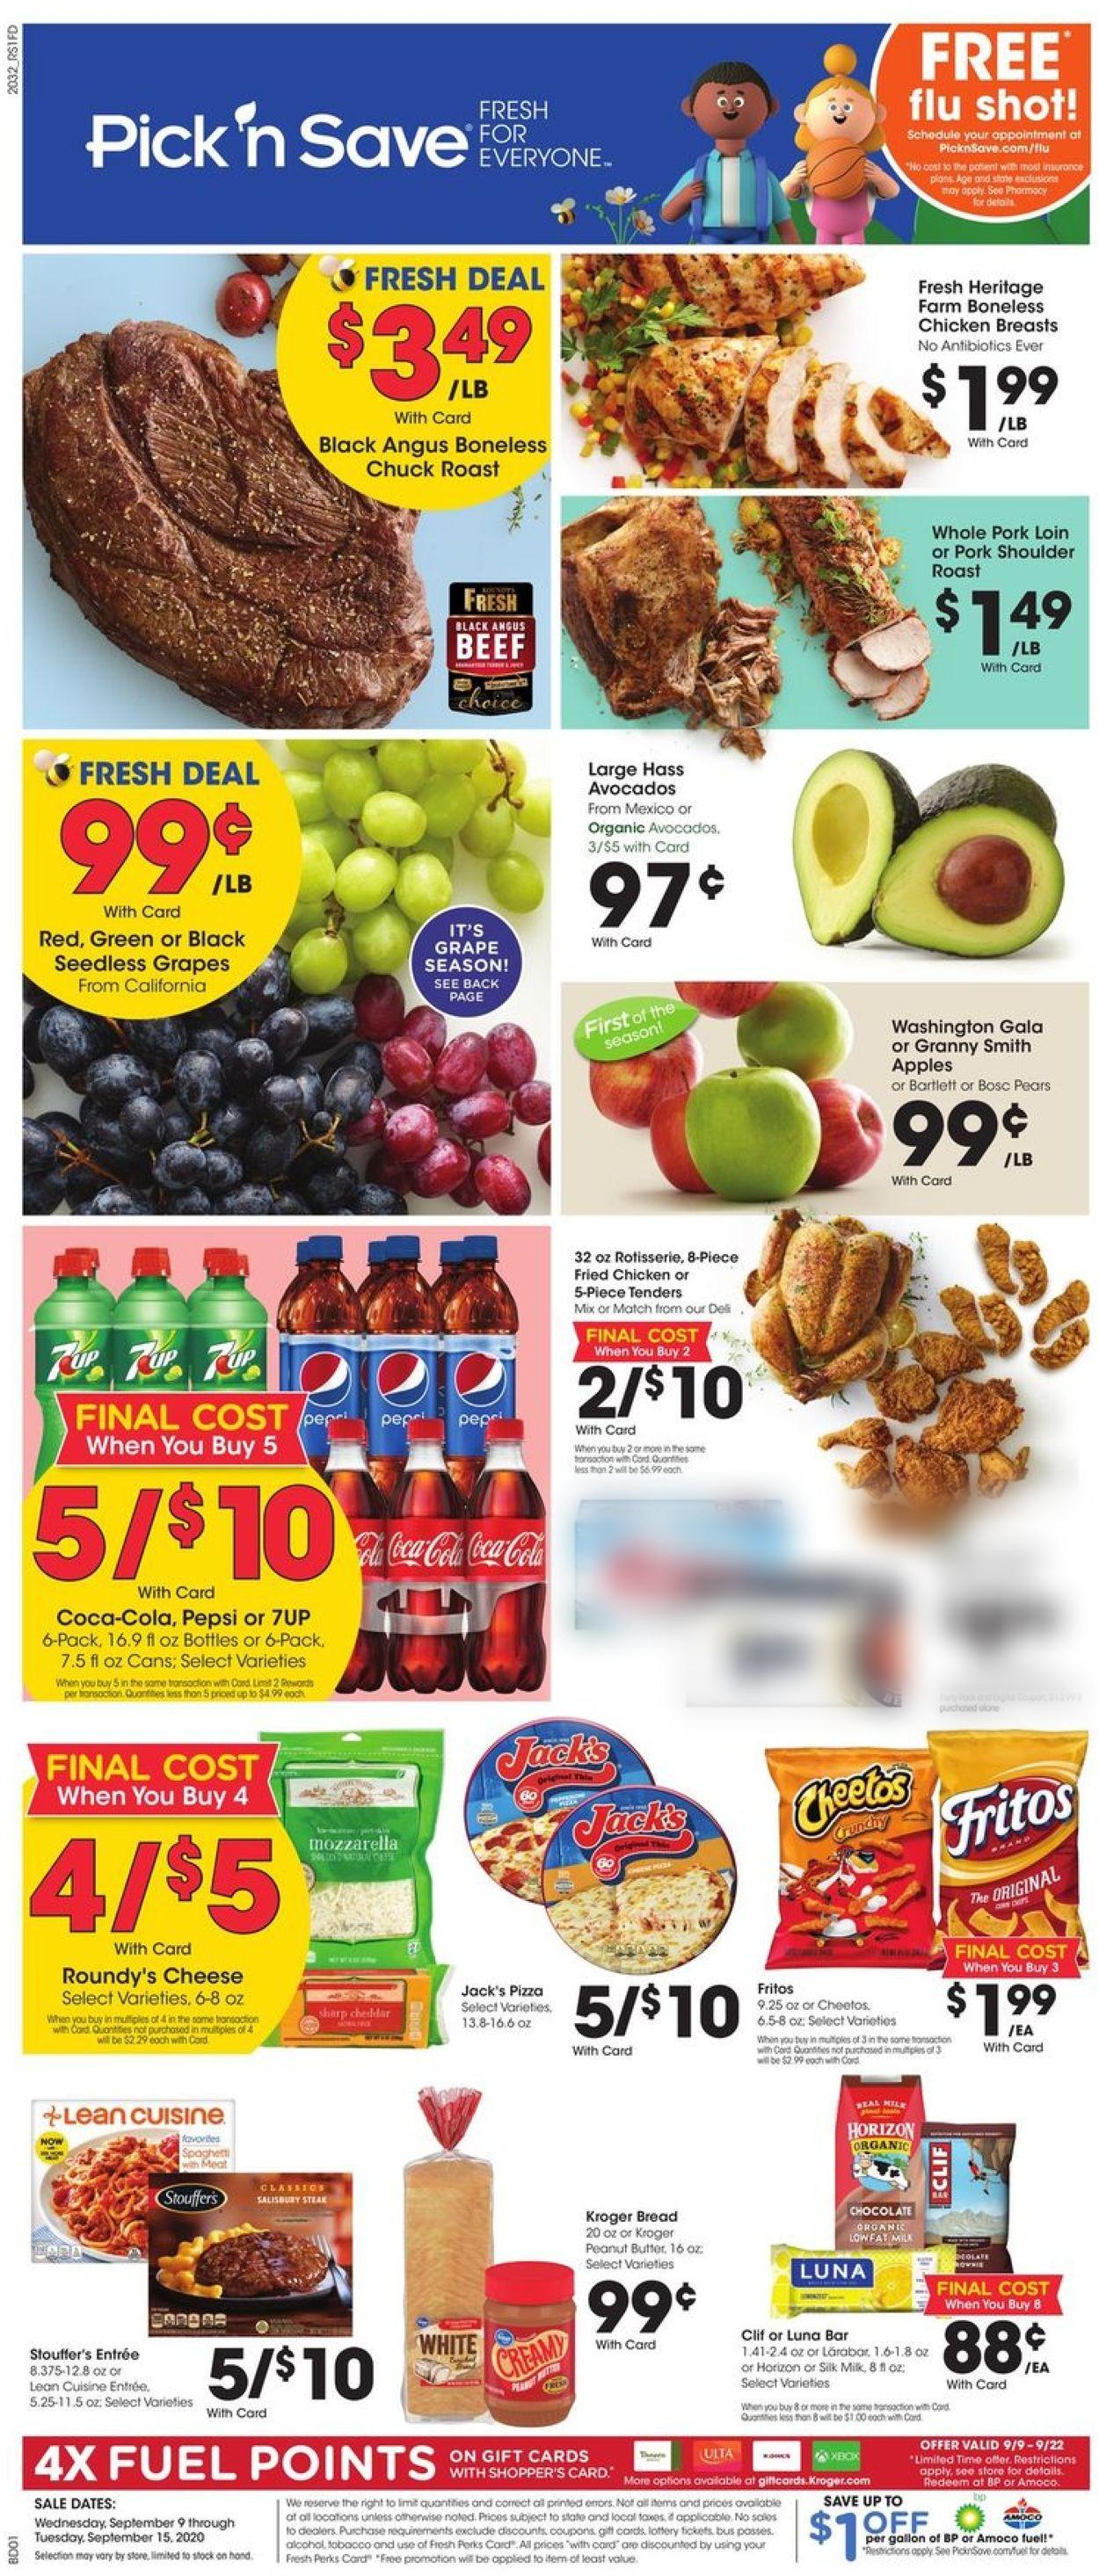 Pick 'n Save Weekly Ad Circular - valid 09/09-09/15/2020